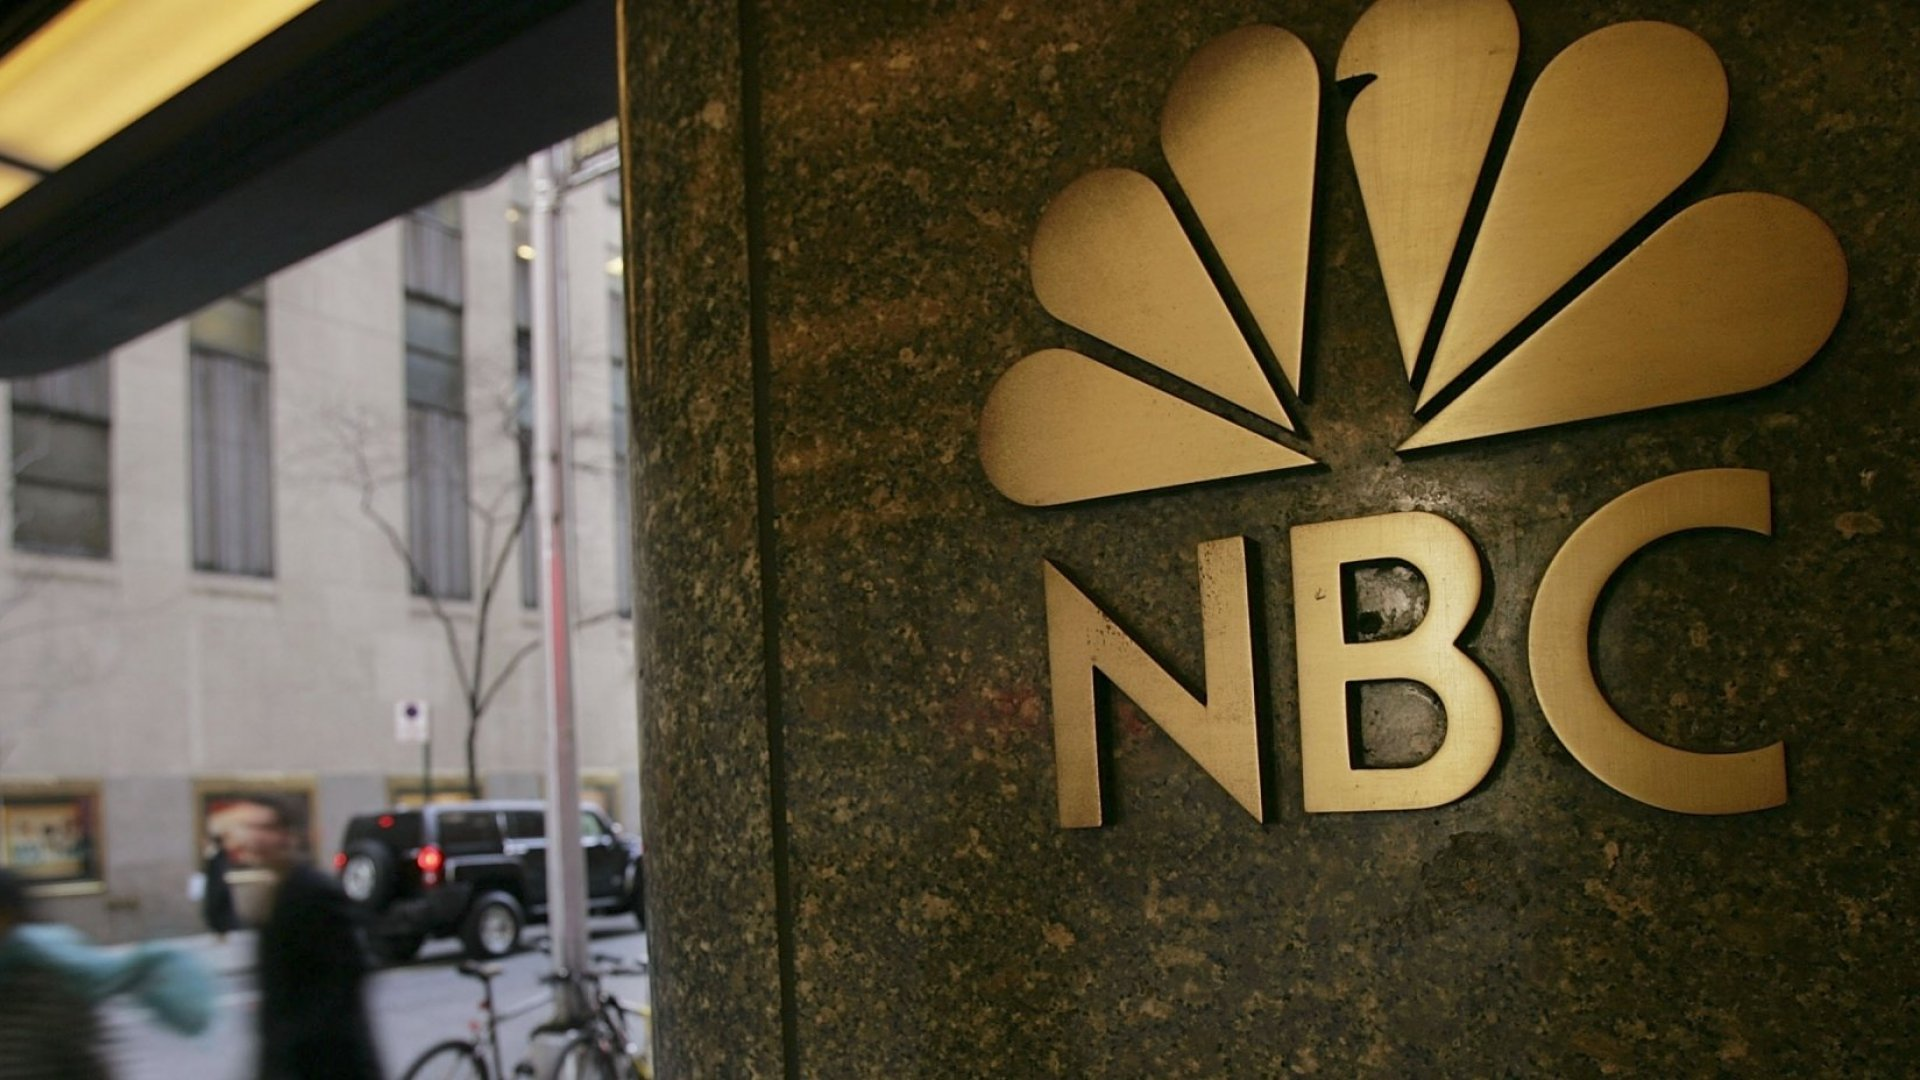 Digital Media Hub Vox Valued at $1B as NBCUniversal Invests